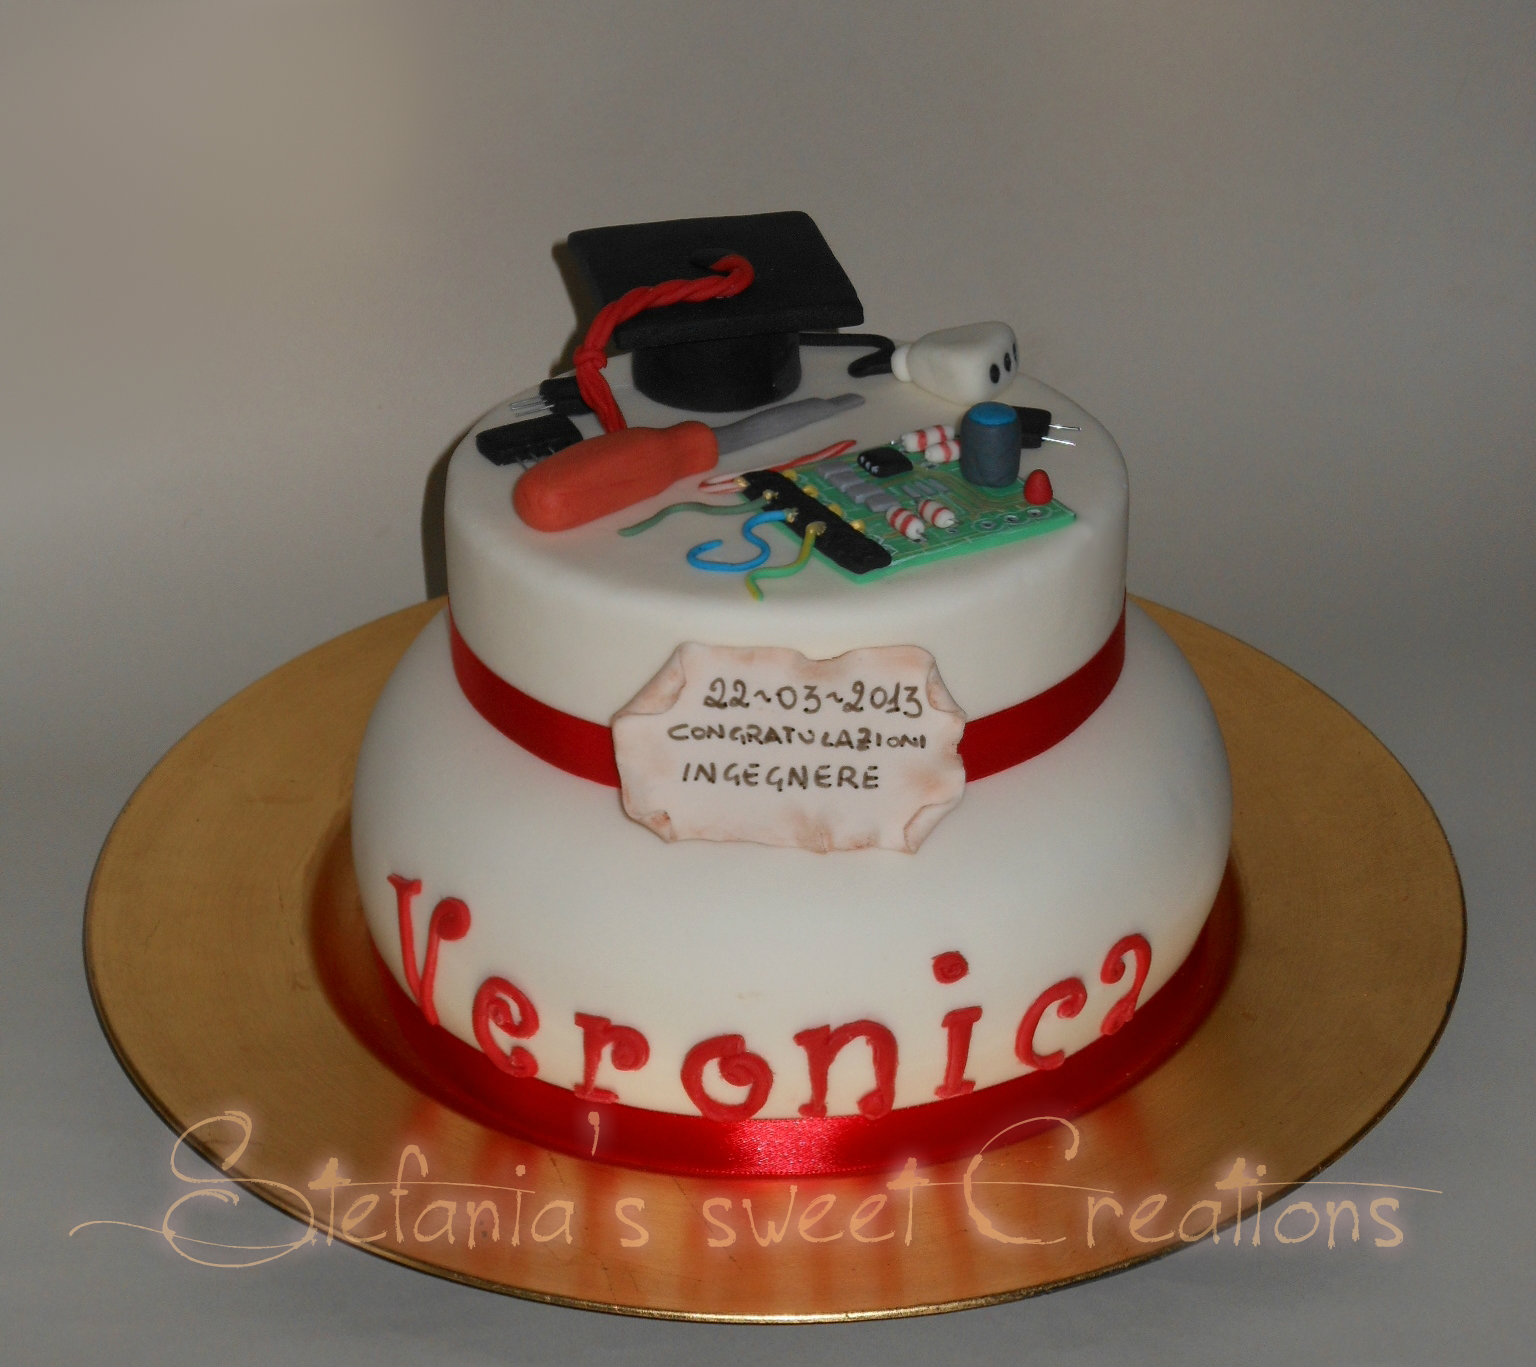 abbastanza Stefania's sweet Creations: Torta di laurea Ingegneria Elettronica IC84